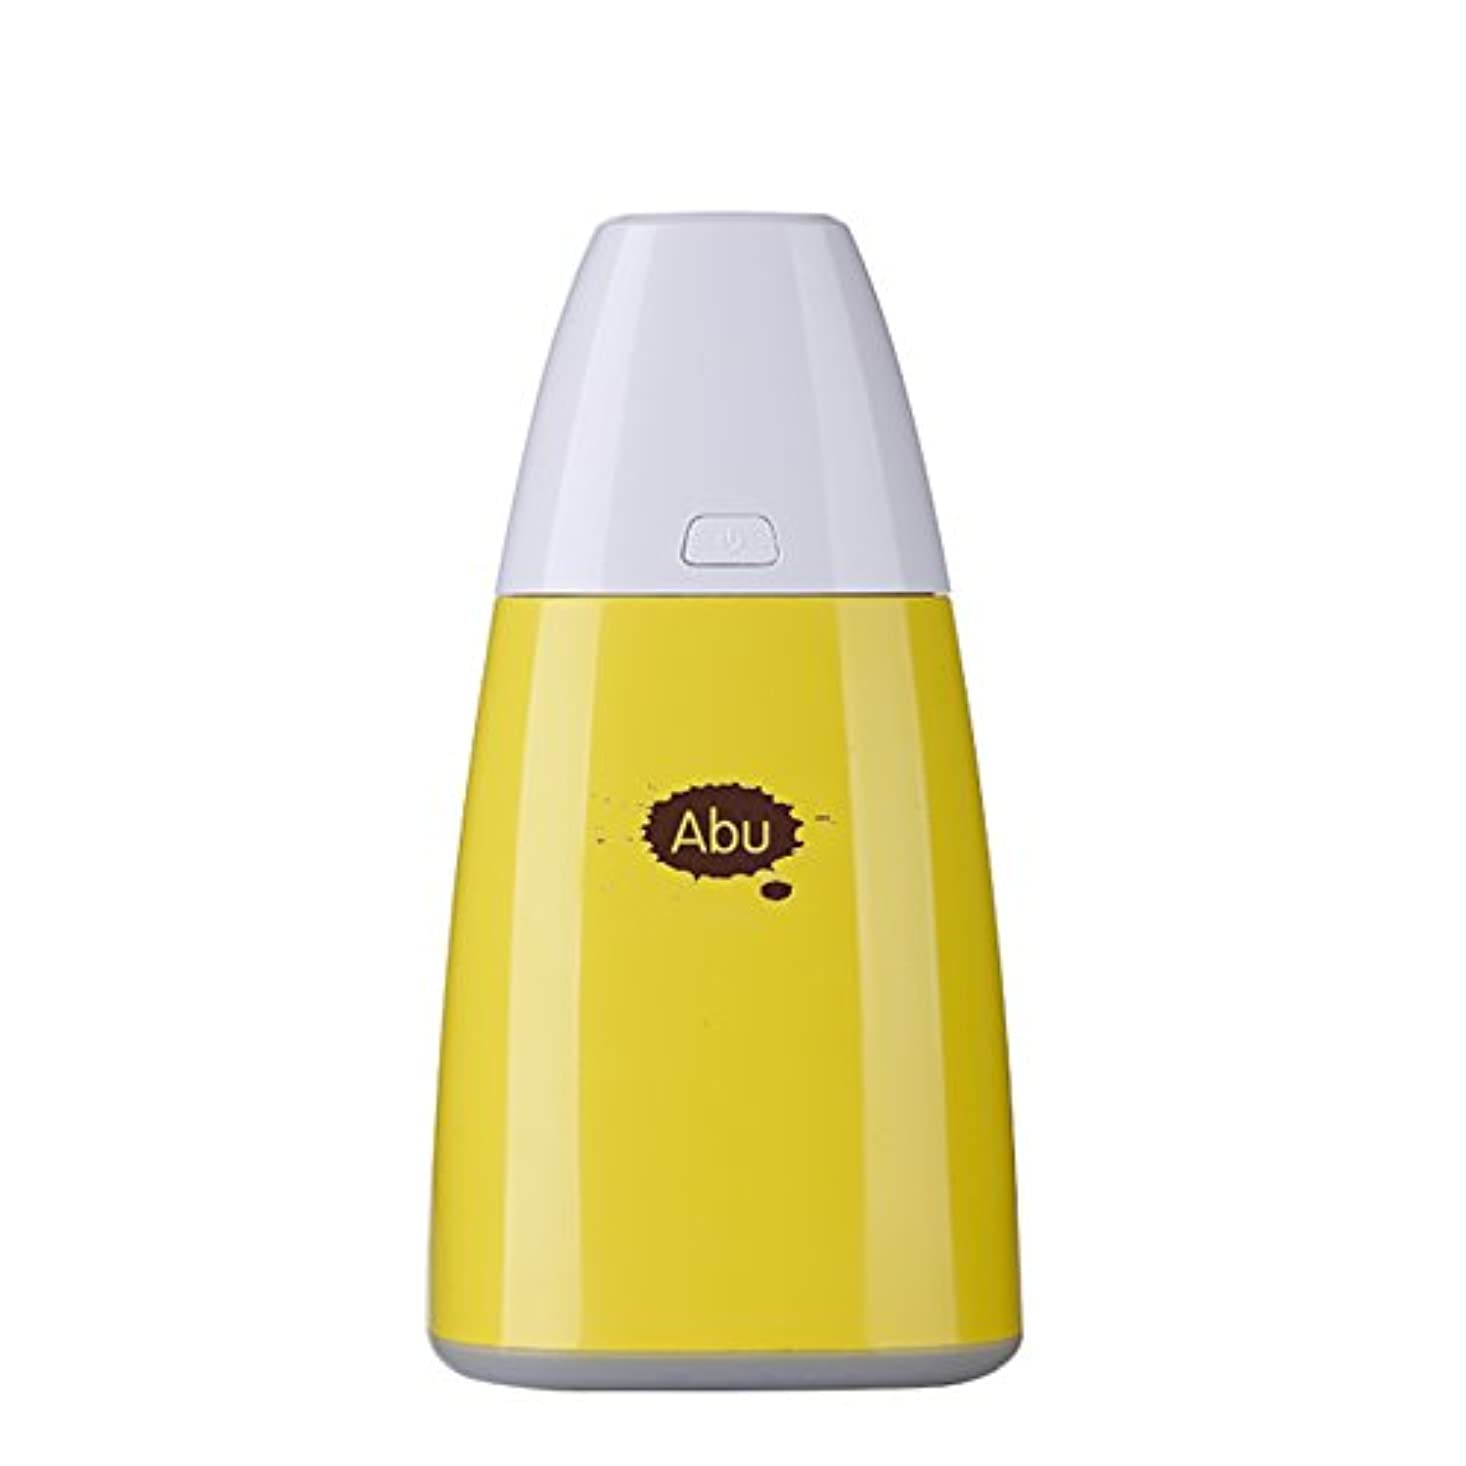 Rakuby 250ml USBポータブル アロマ セラピーエッセンシャルオイル ディフューザー ミニ 超音波 クールミスト加湿器 カラフル LEDライト ホームオフィス 寝室用